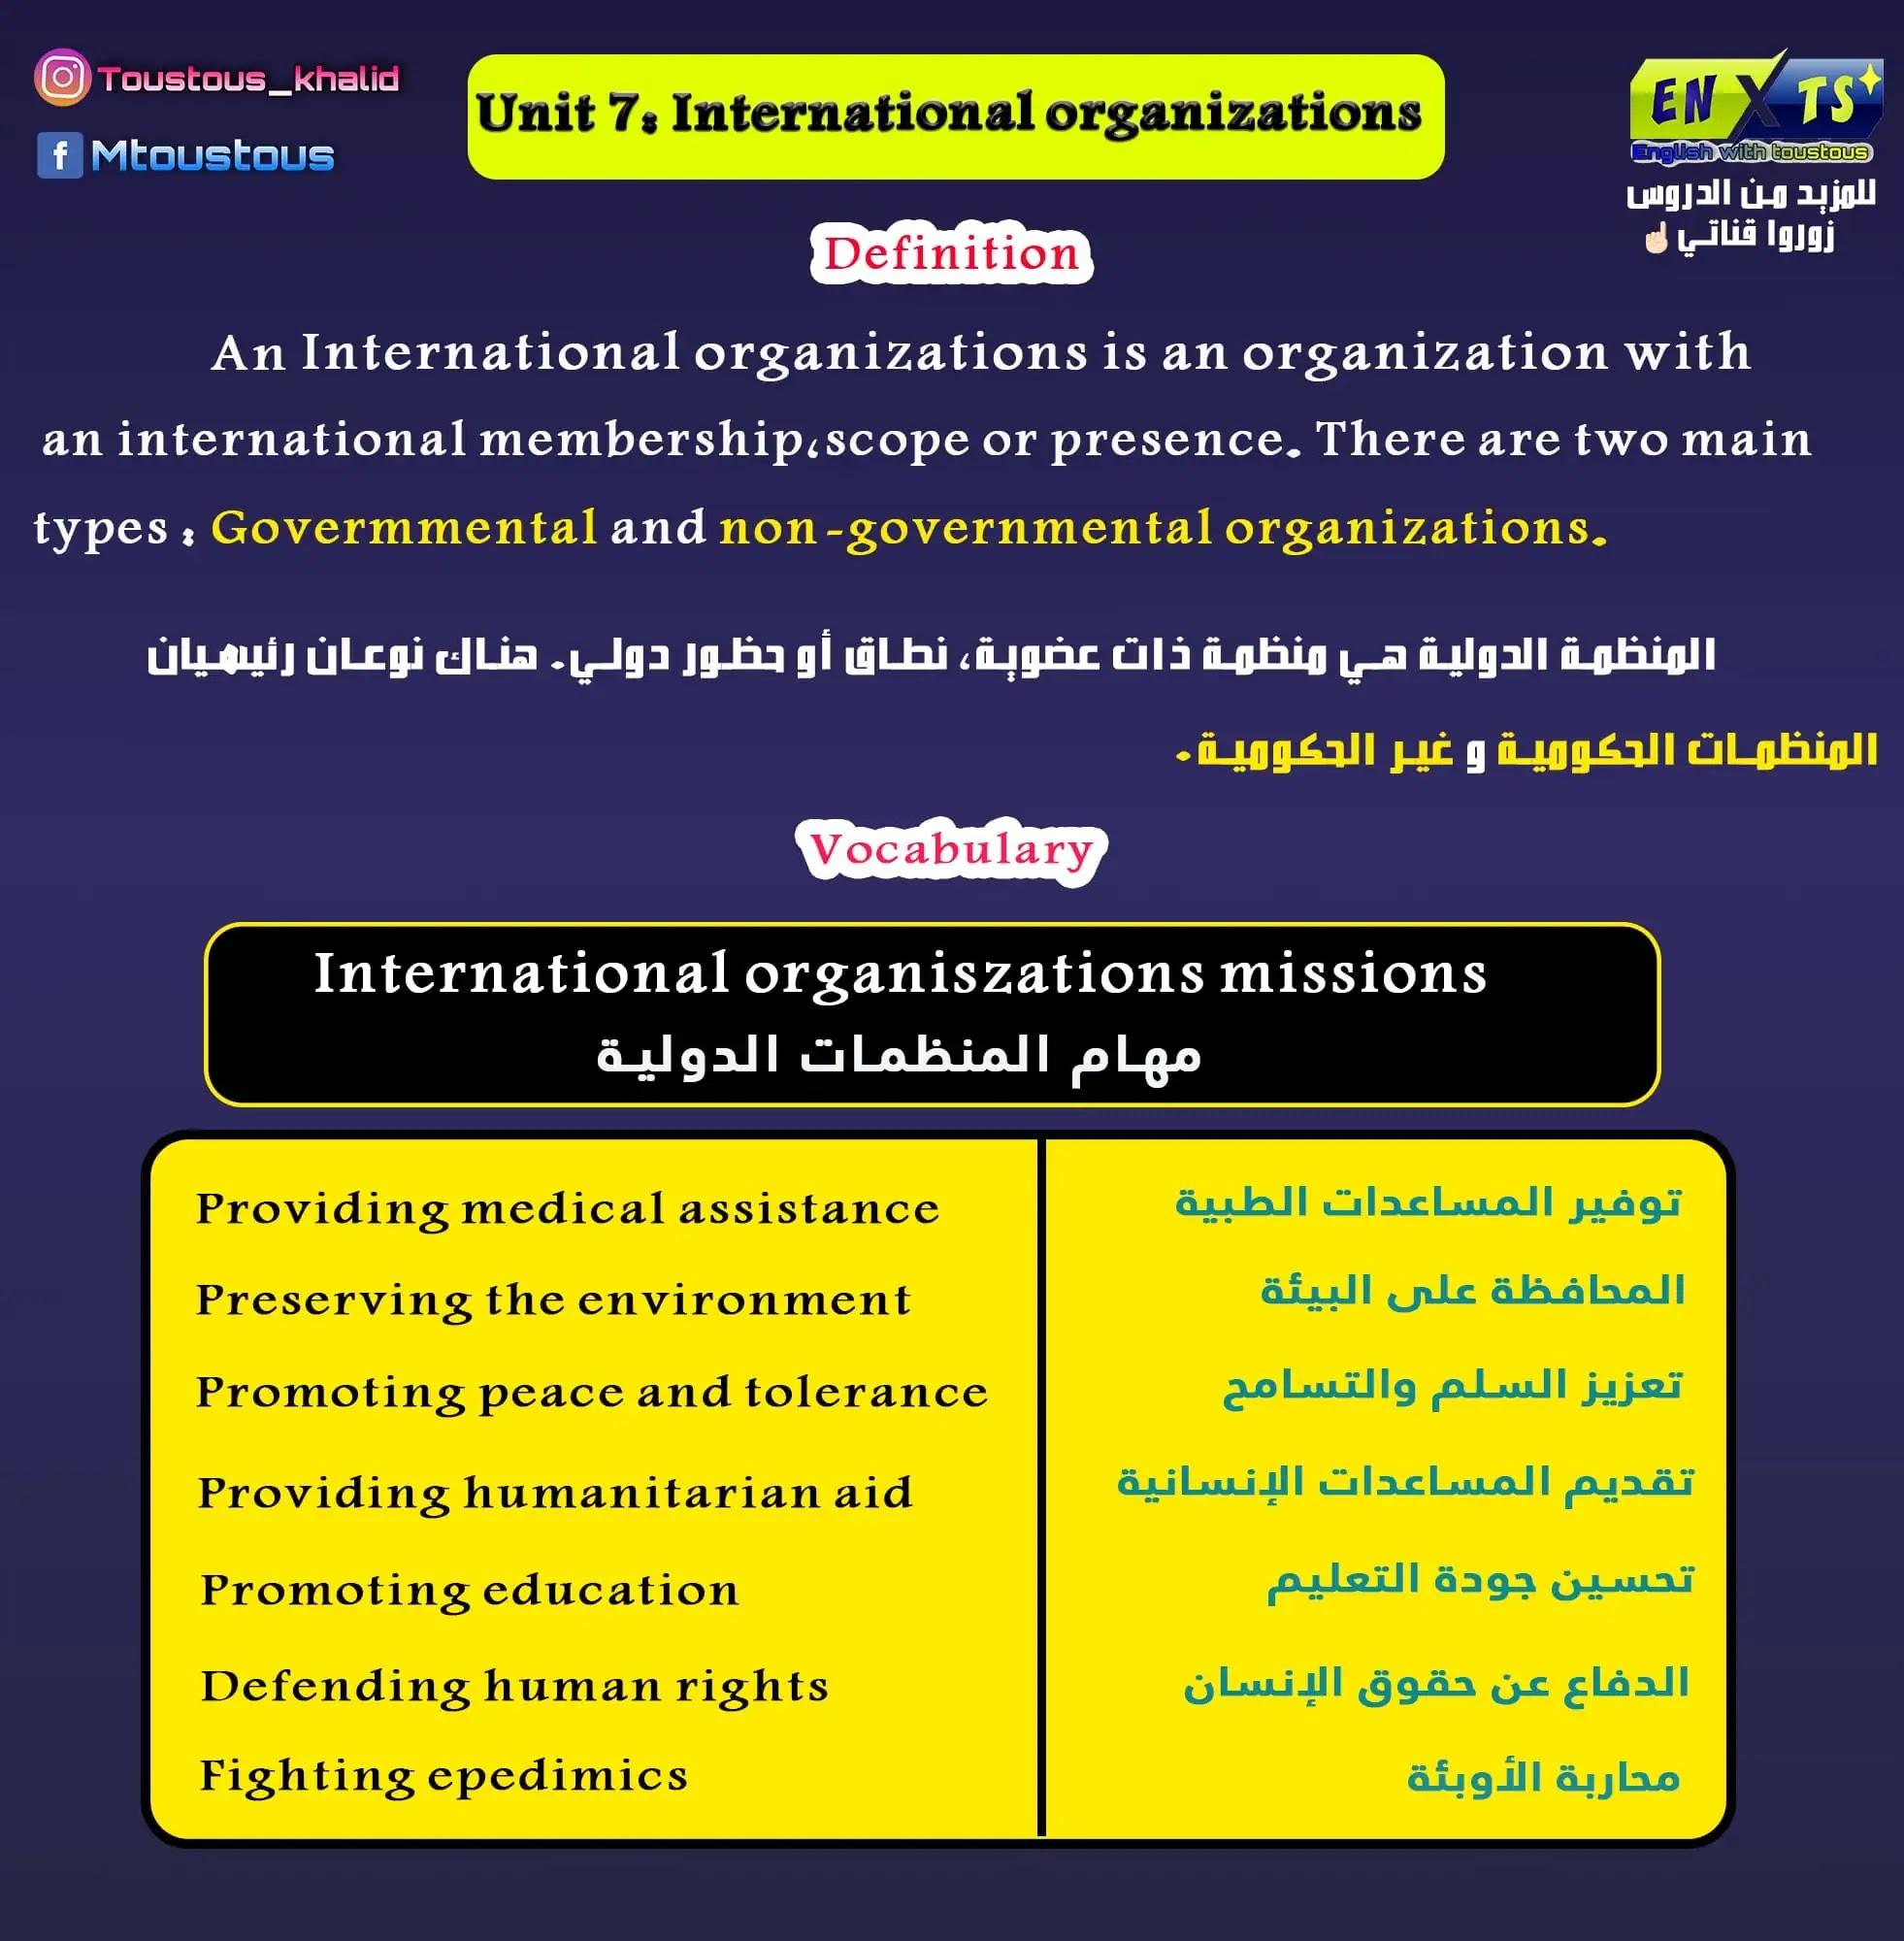 unit 7: International organization